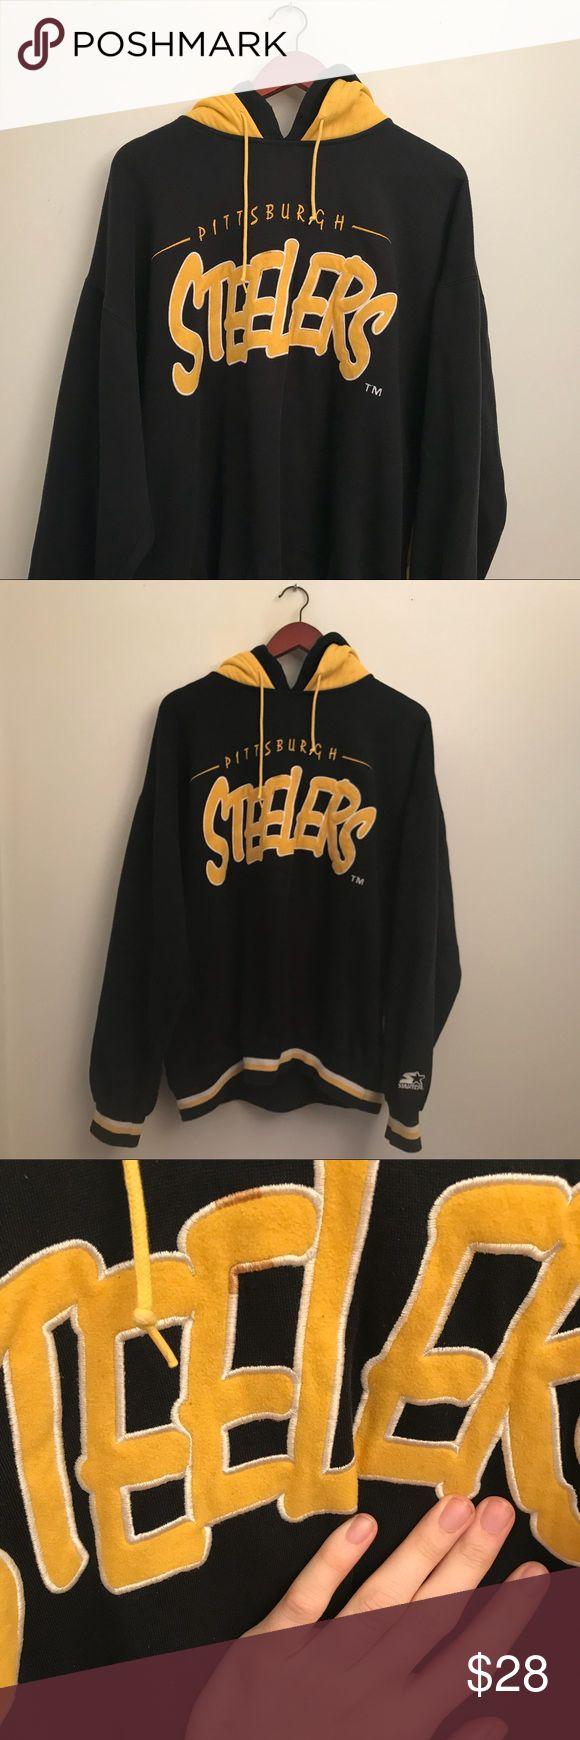 Vintage Starter Pittsburgh Steelers double hoodie CRAZY